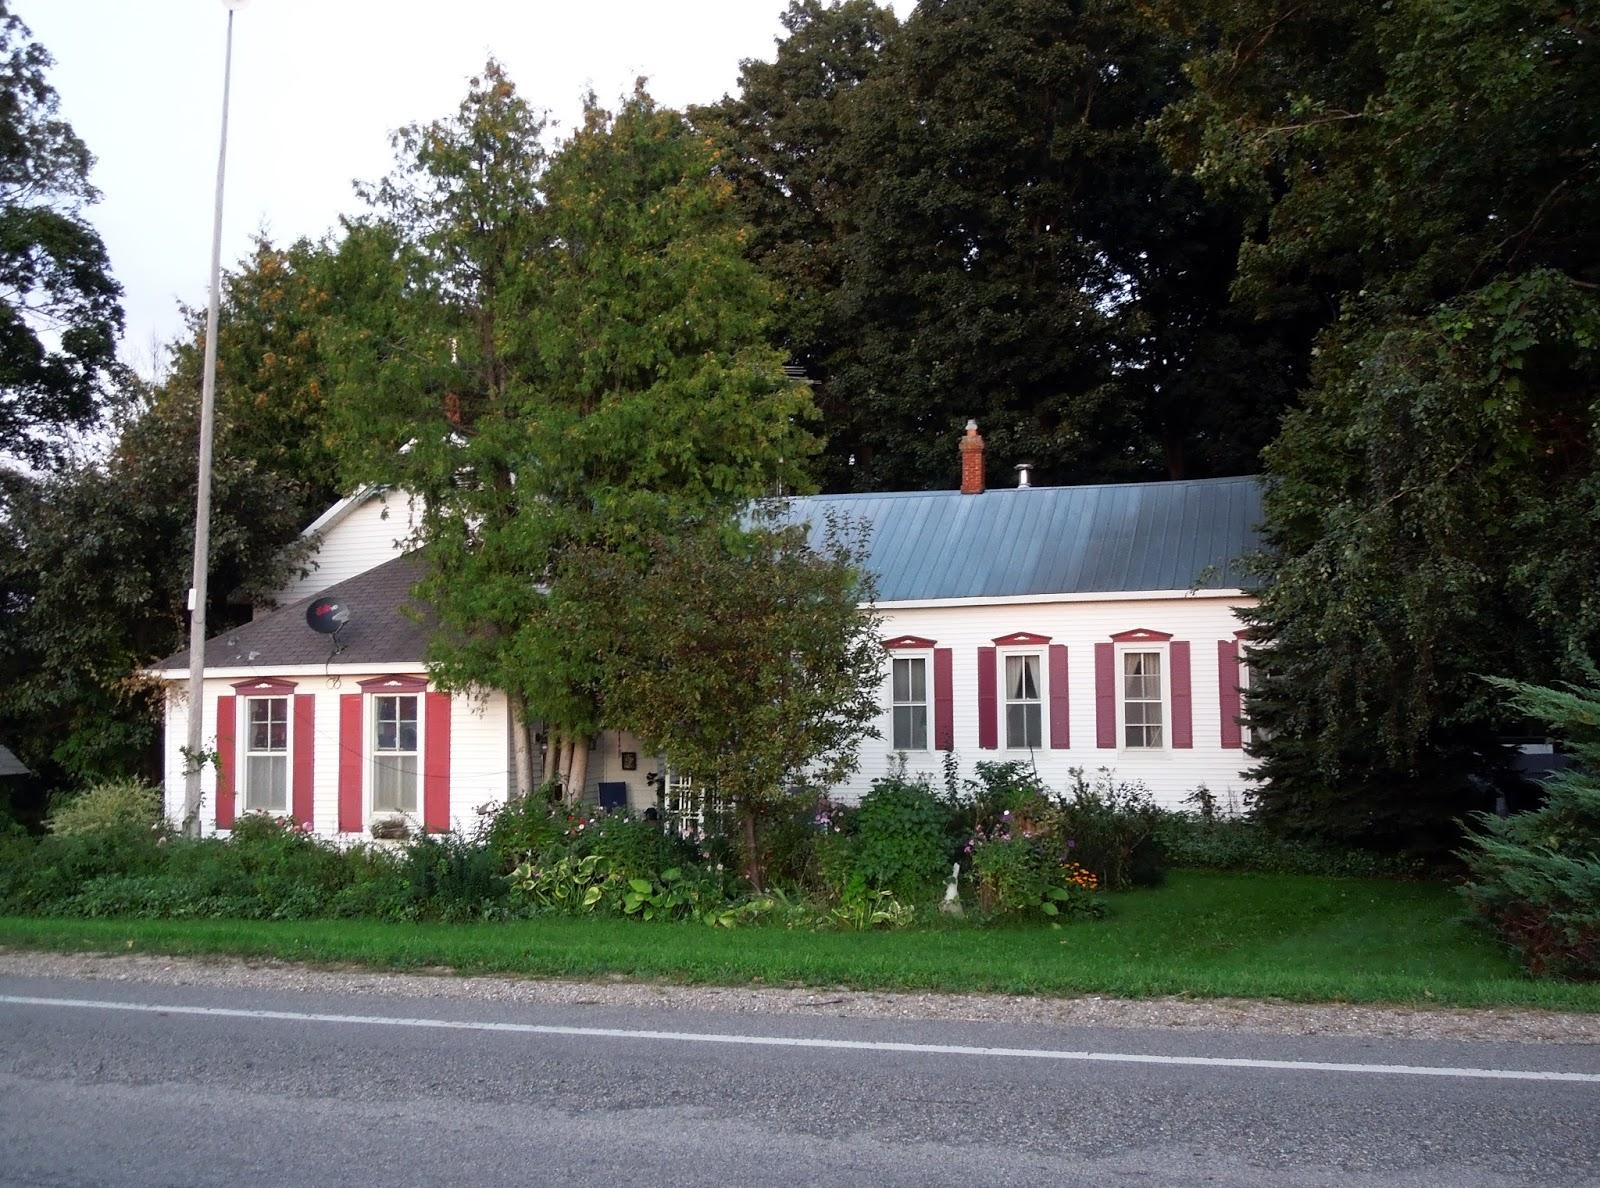 Michigan antrim county kewadin - Location 11509 Cherry Road Rapid City